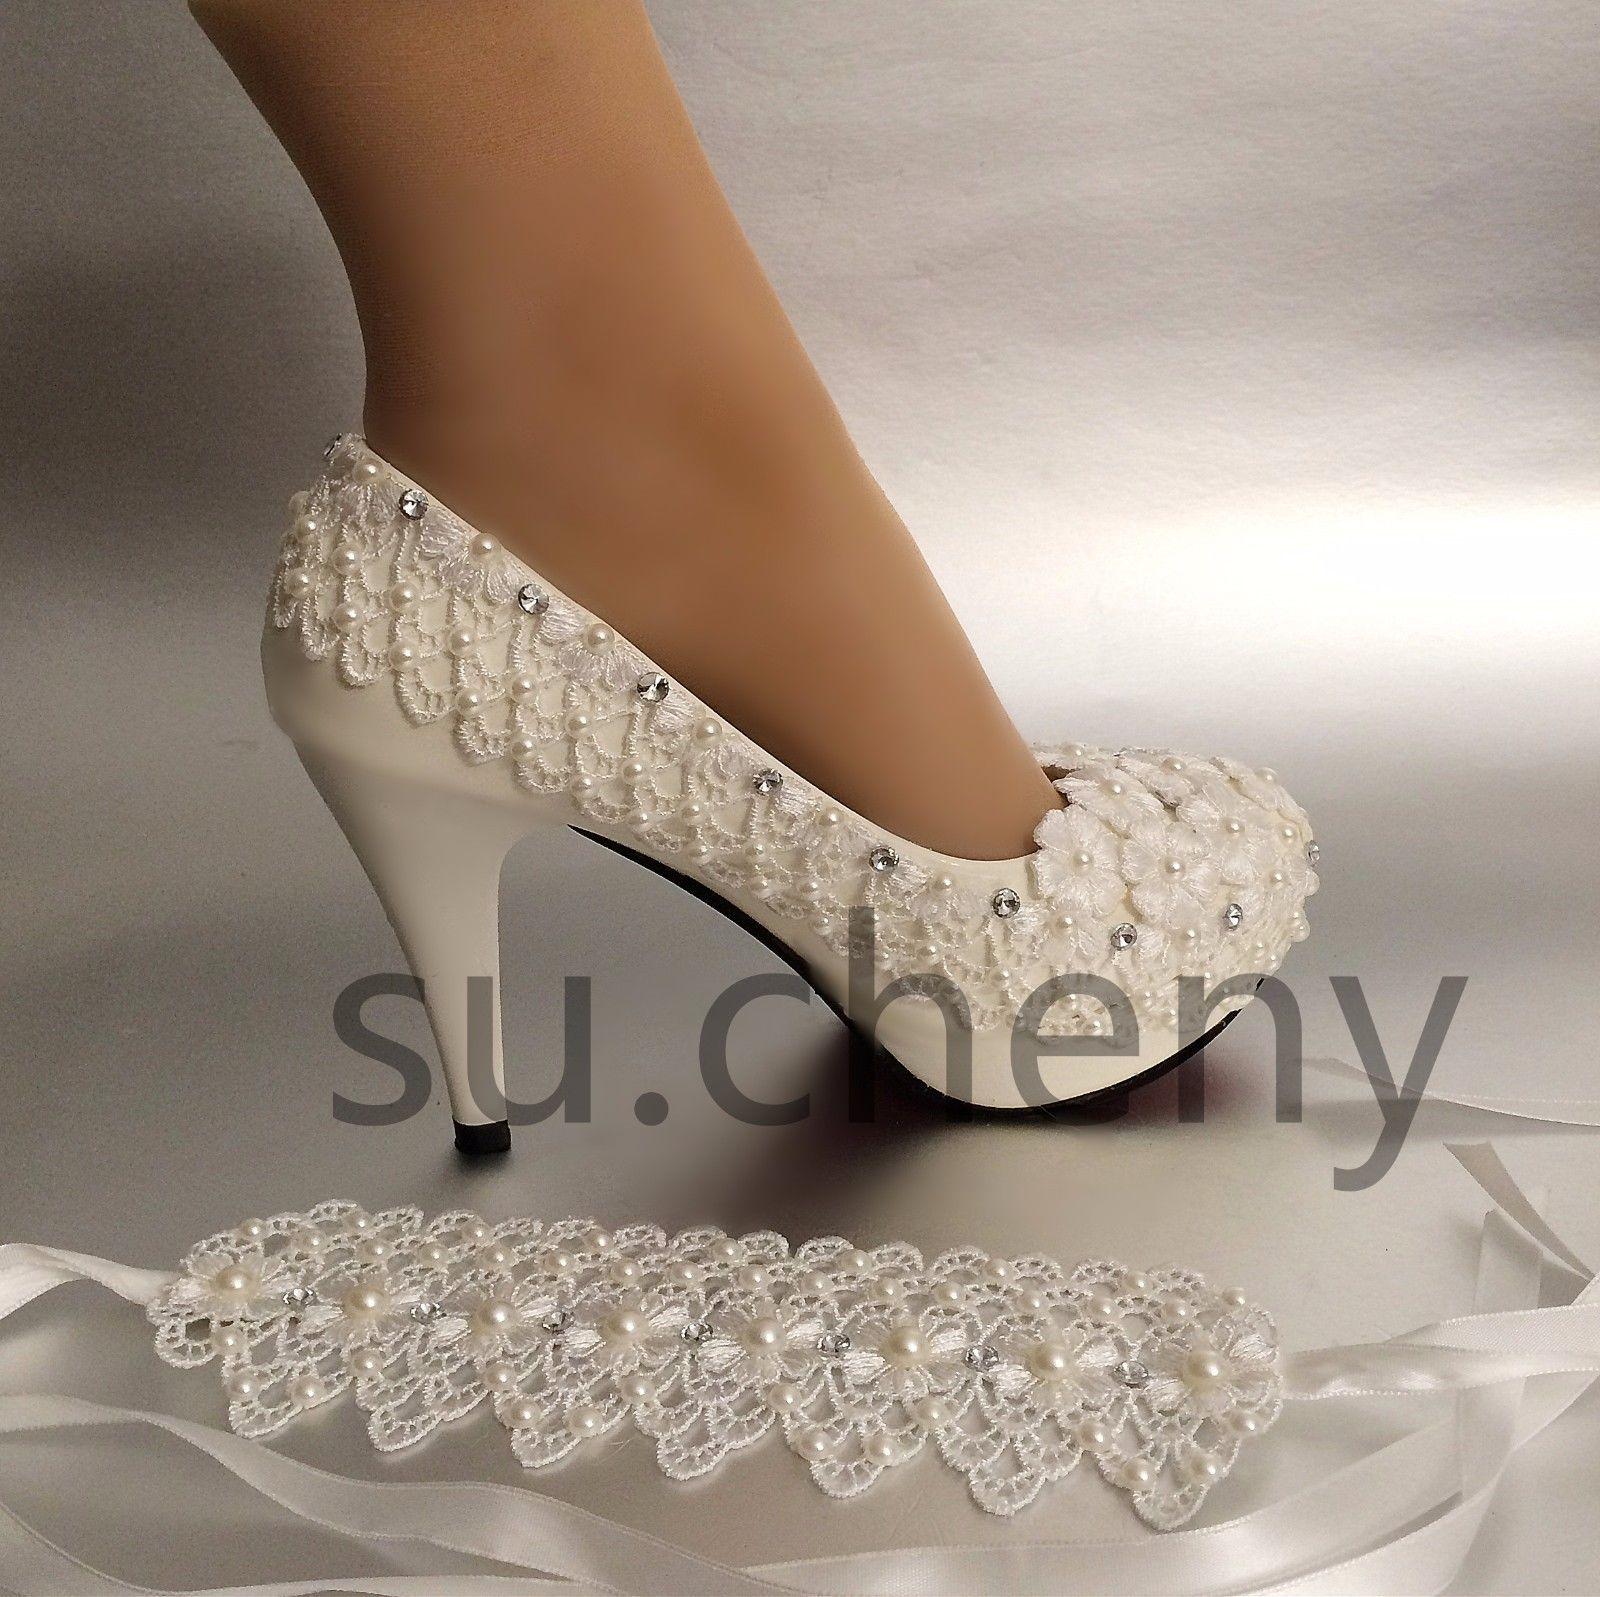 Su Cheny 3 4 Heel White Ivory Lace Ribbon Pearls Wedding Shoes Bride Size 5 11 Ebay Valentino Wedding Shoes Wedding Shoes Bride Wedding Shoes Pumps